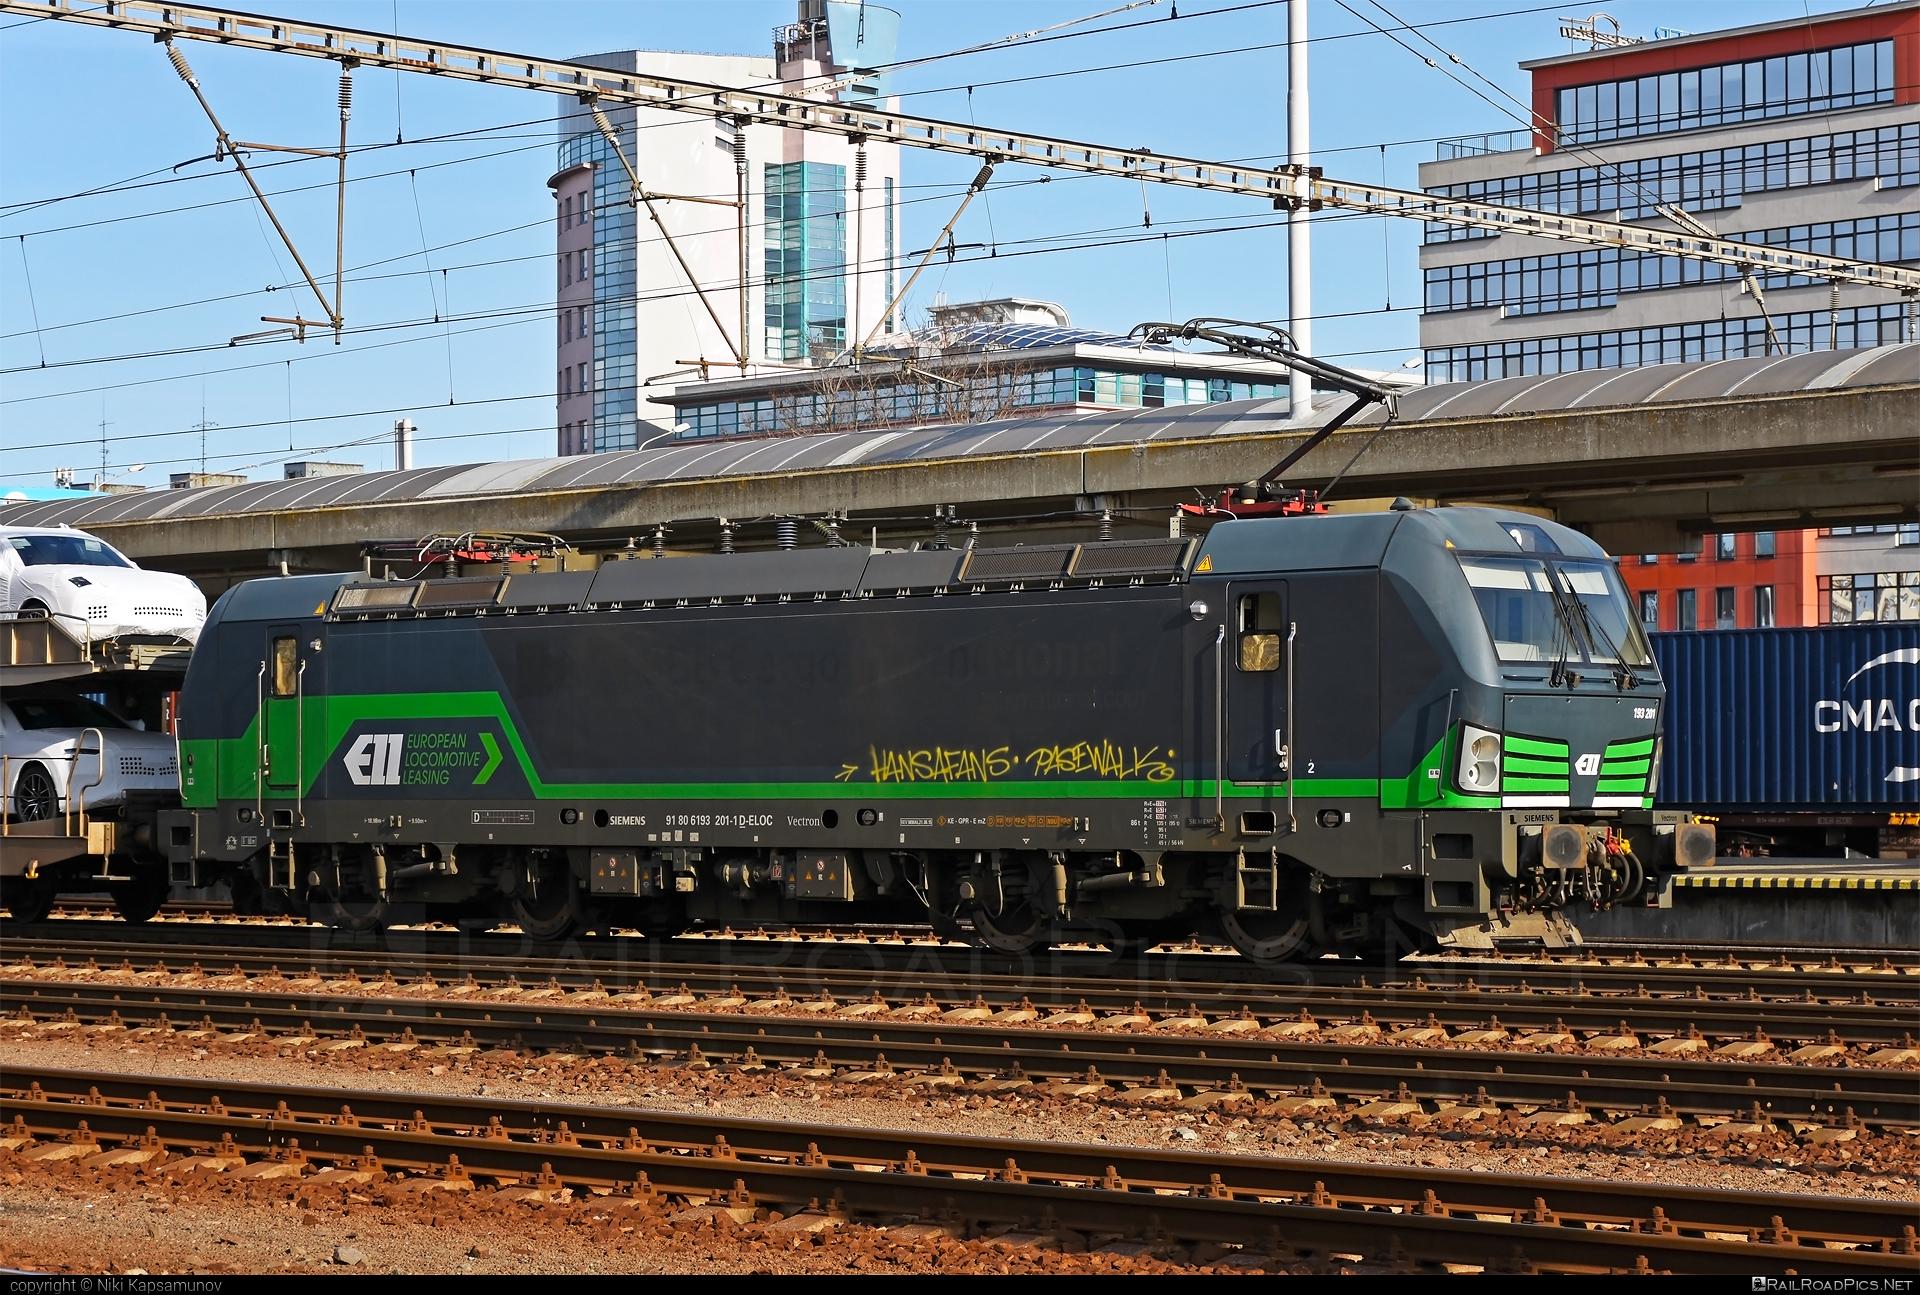 Siemens Vectron AC - 193 201 operated by ecco-rail GmbH #eccorail #eccorailgmbh #ell #ellgermany #eloc #europeanlocomotiveleasing #siemens #siemensvectron #siemensvectronac #vectron #vectronac